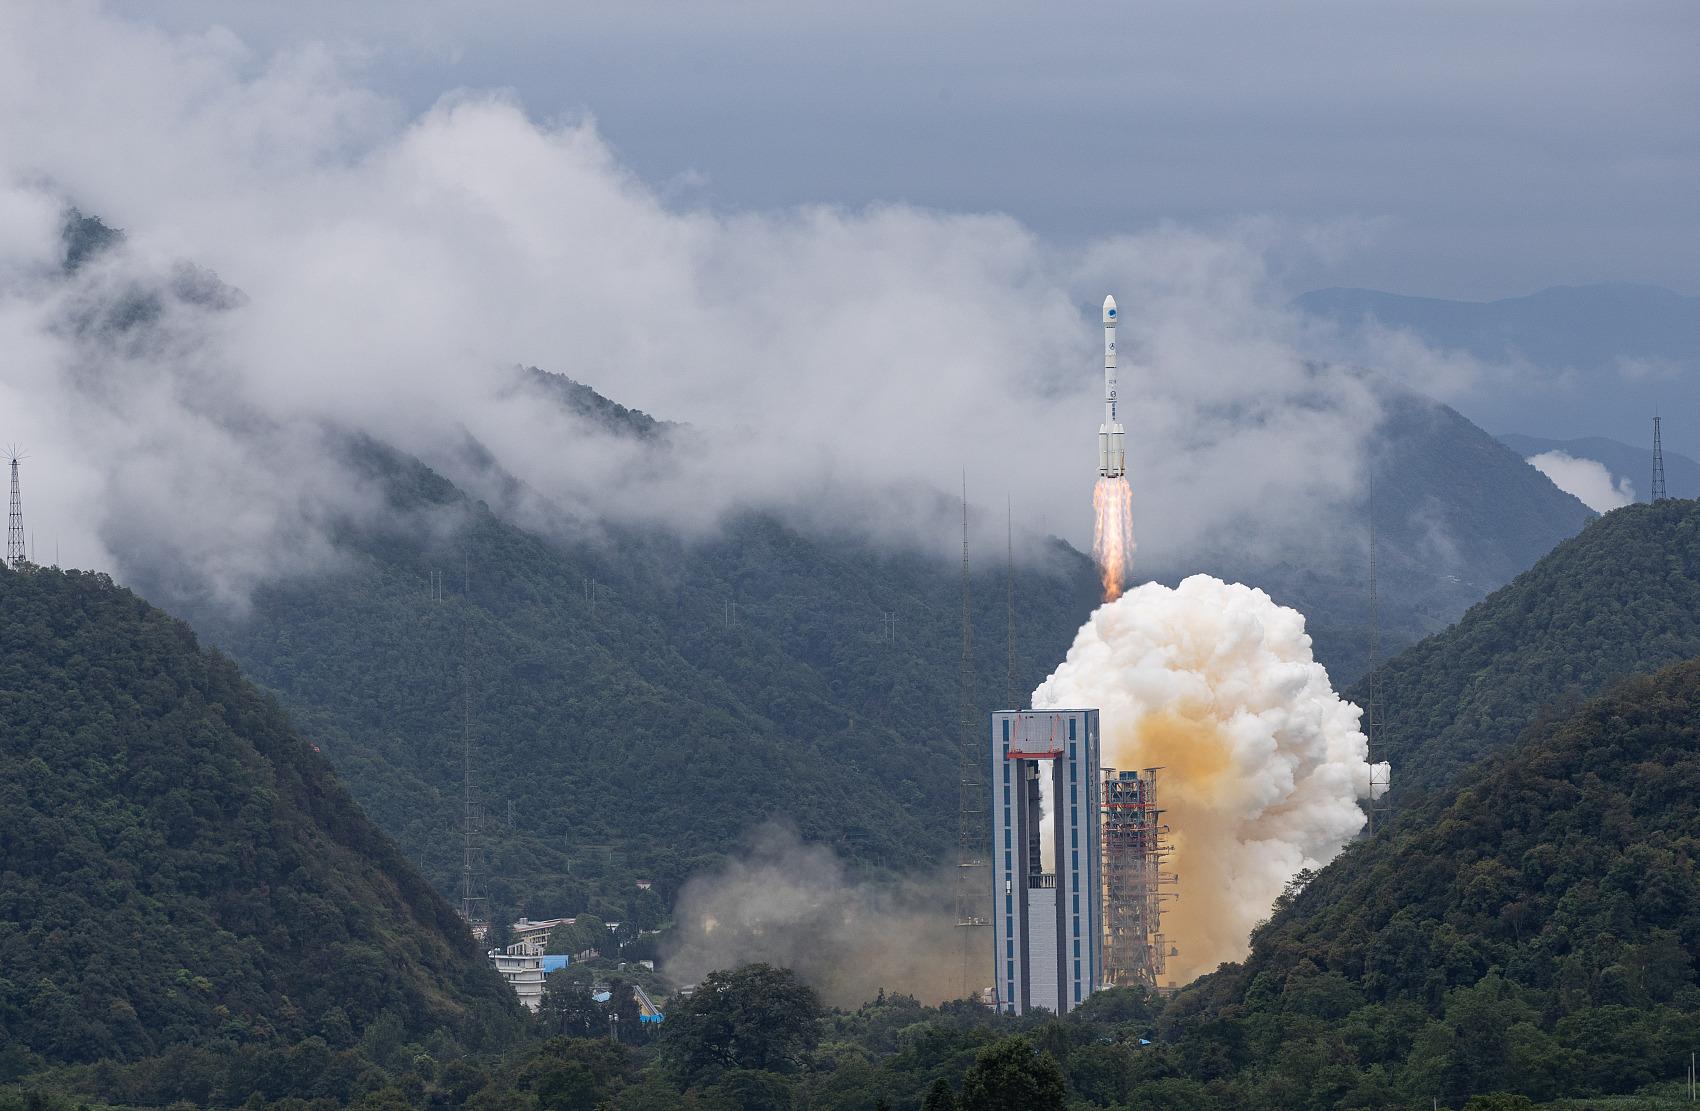 China calls for cooperation in aerospace development: spokesperson